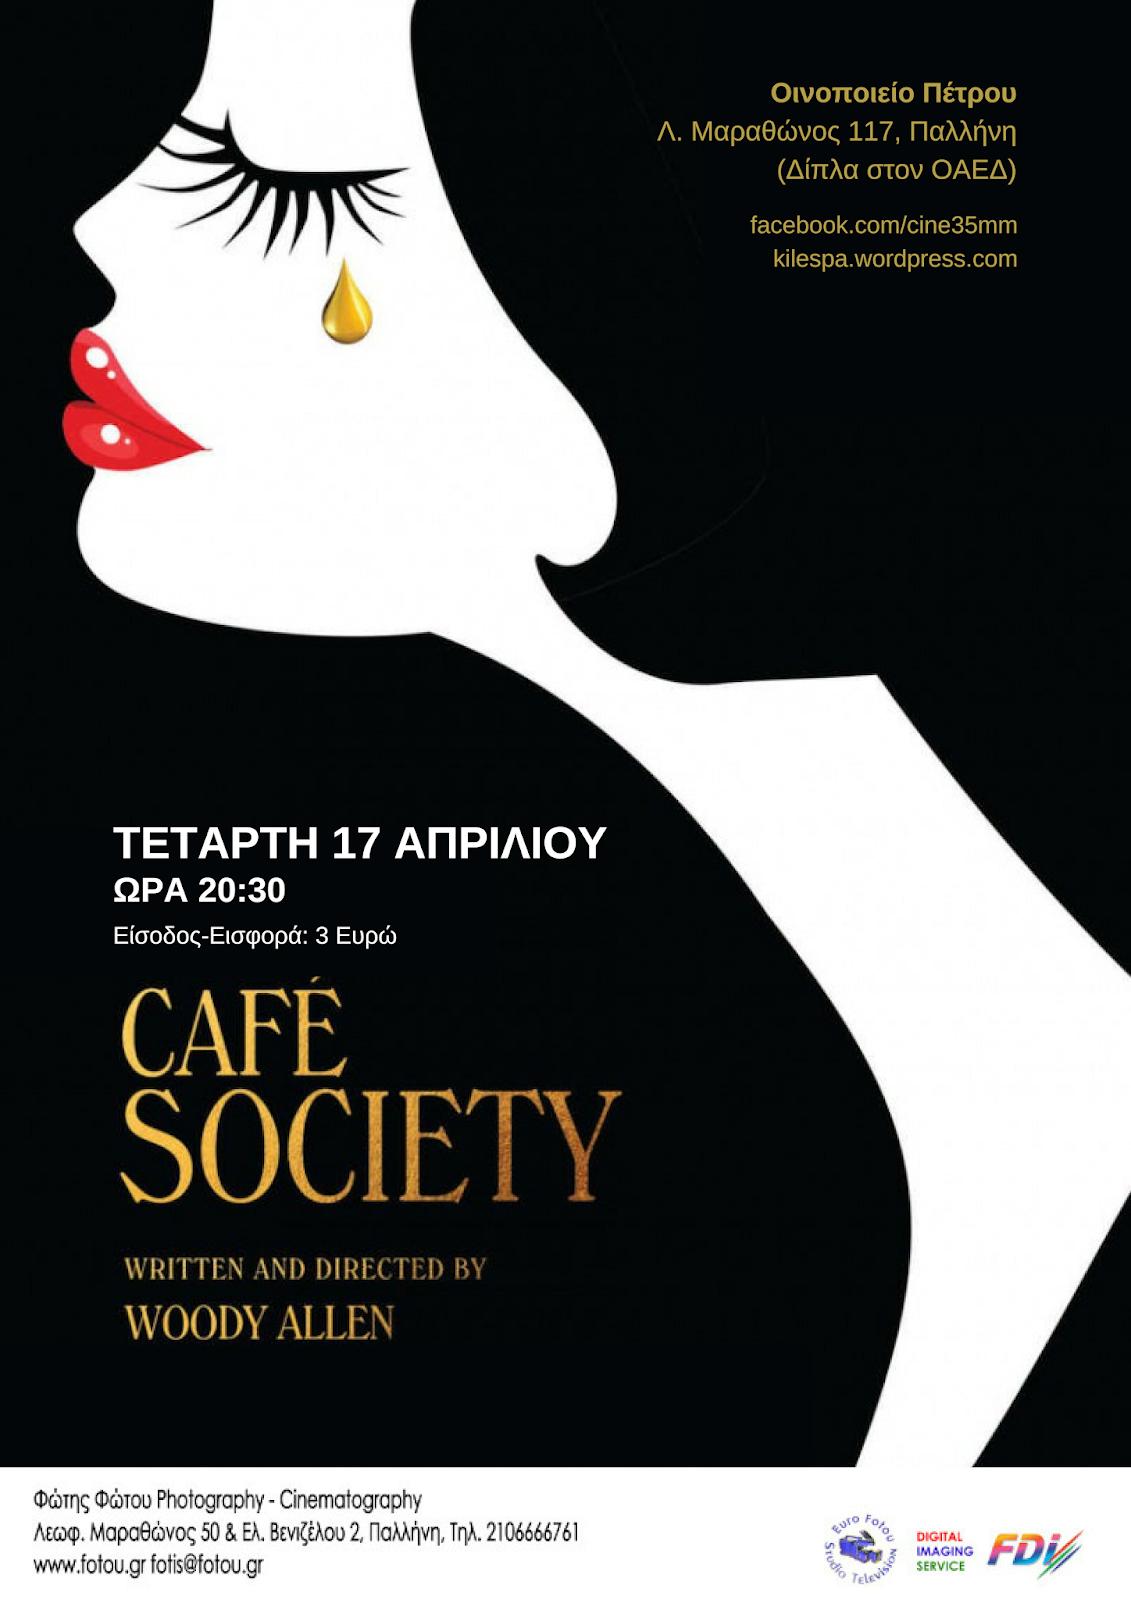 56fe4a673ea Cafe Society, στην Κινηματογραφική Λέσχη Παλλήνης. Τελευταία ταινία της  σεζόν!